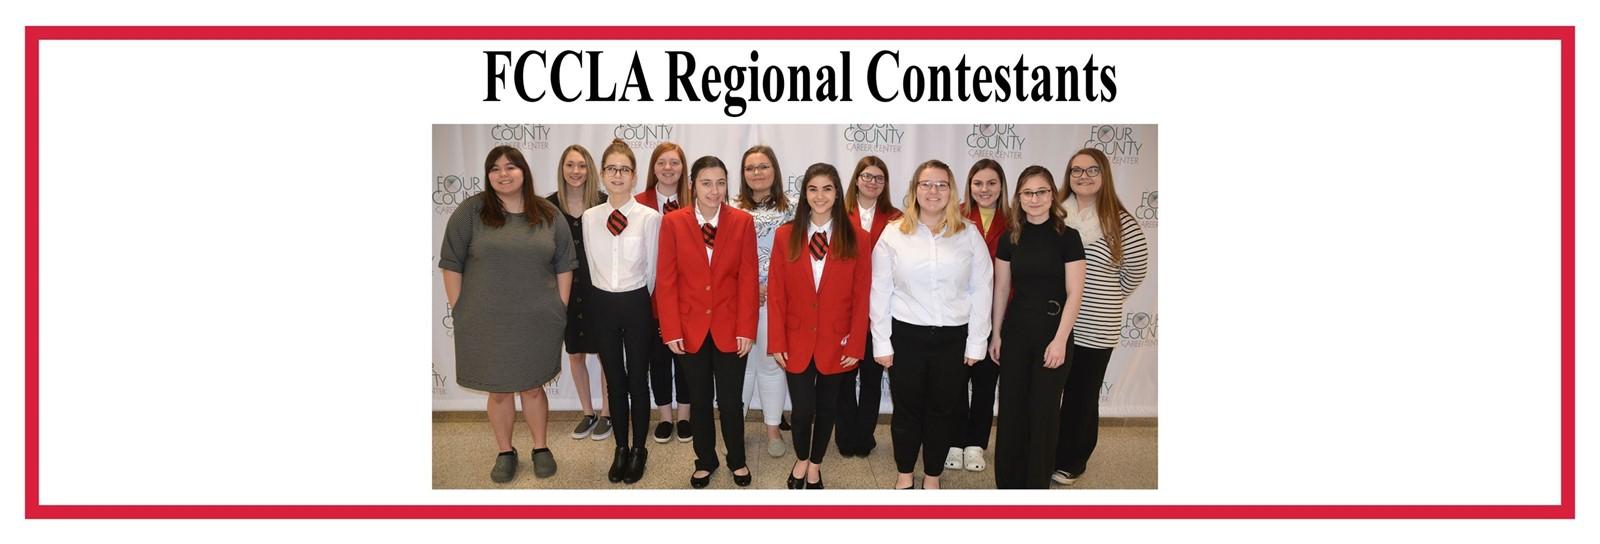 FCCLA Regionals